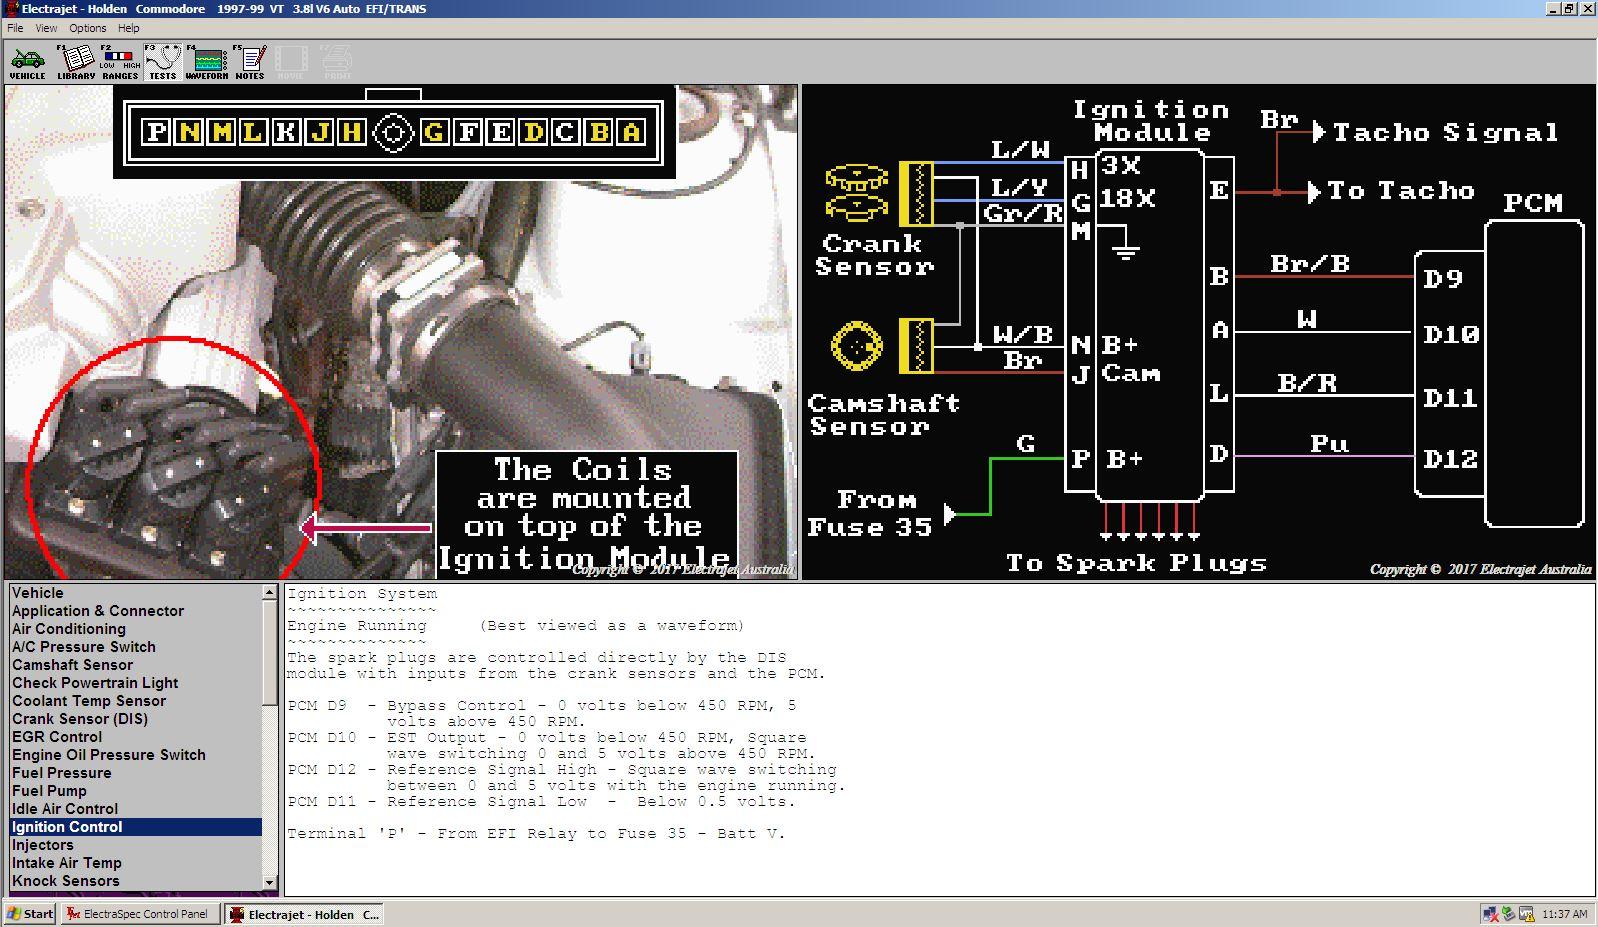 Vx Commodore Wiring Diagram:  P 6 G Motorsrh:pandgmotors.com.au,Design